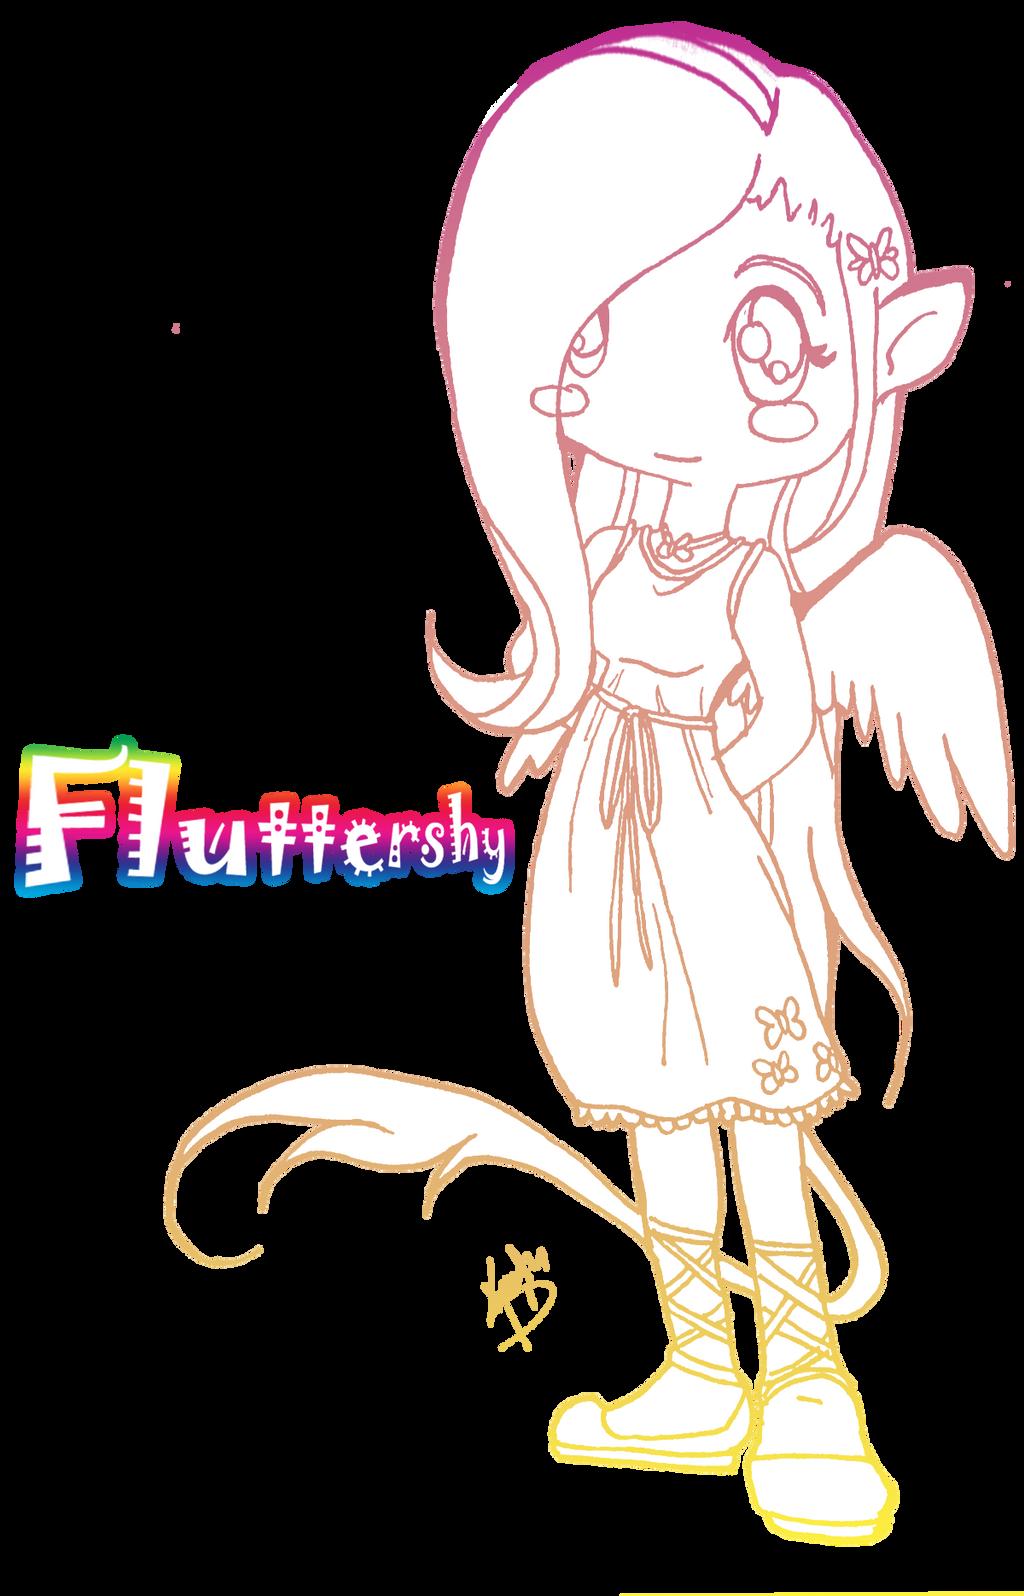 fluttershy human chibi by kristyd on deviantART